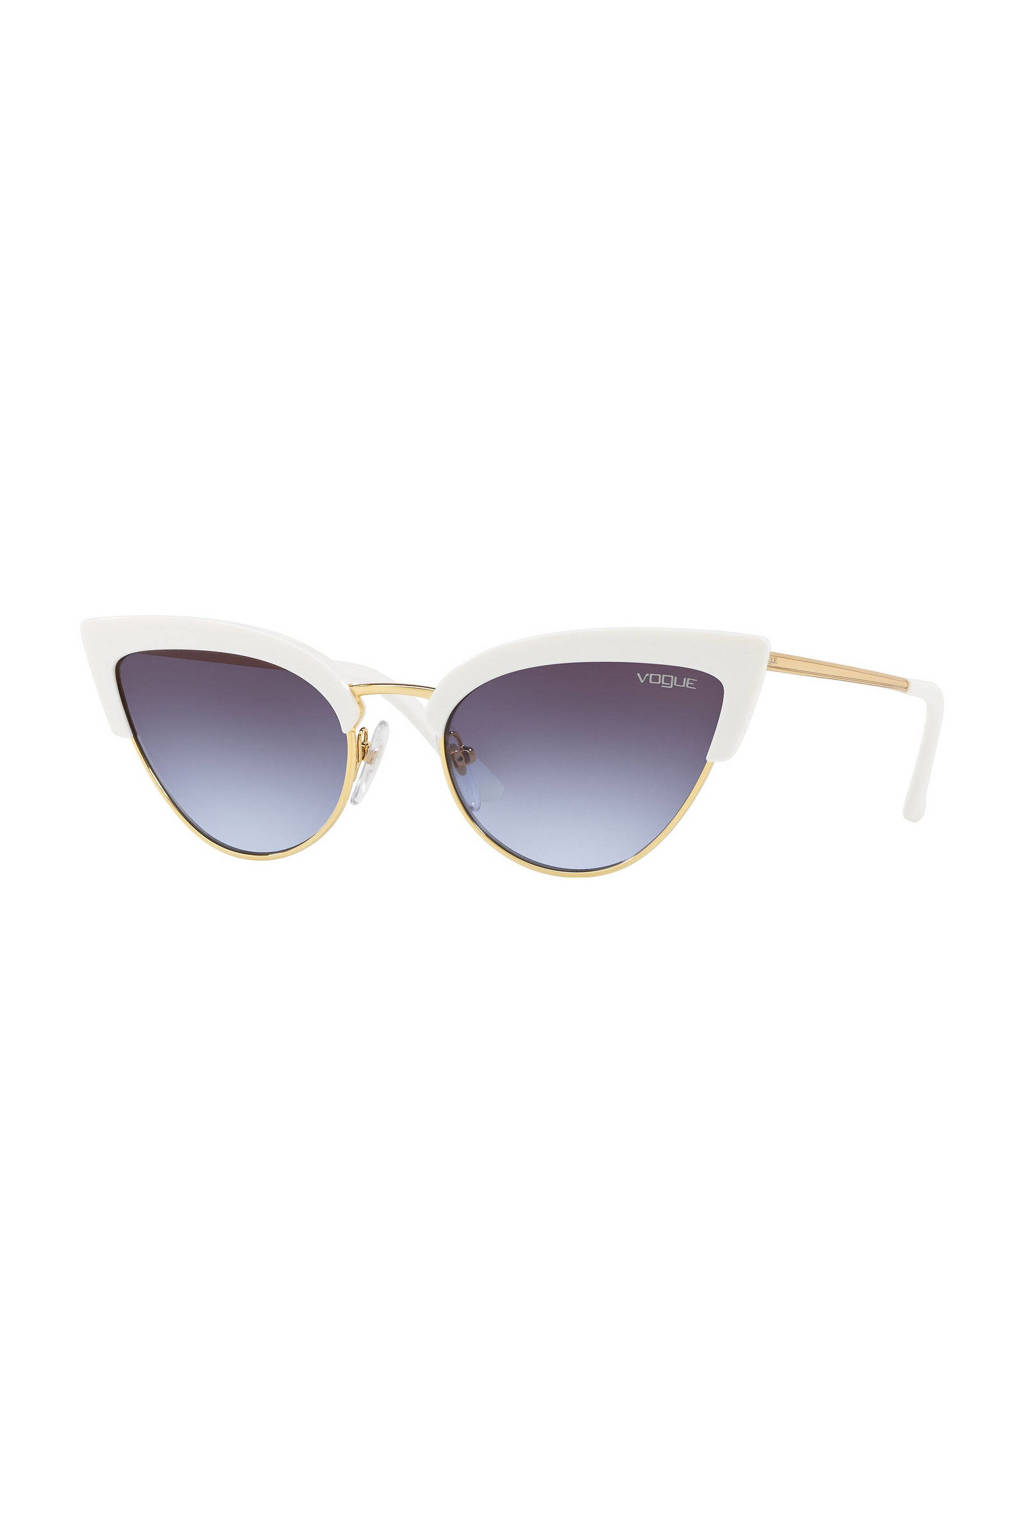 Vogue zonnebril 0VO5212S, Violet/grijs